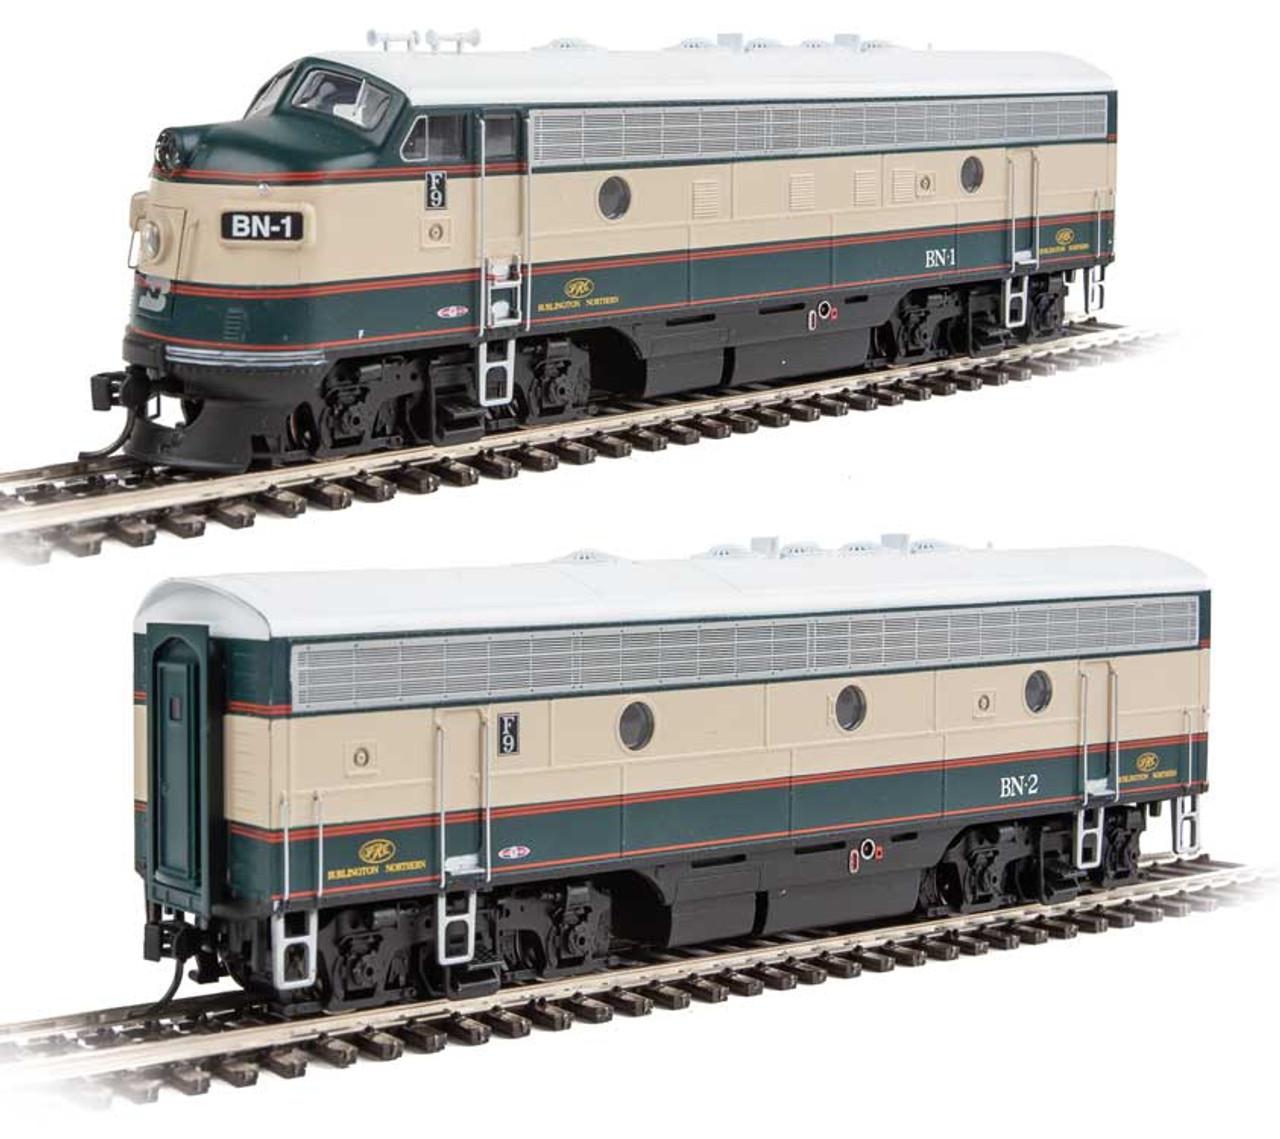 EMD F7 A-B Set - ESU Sound and DCC -- Burlington Northern #1, 2 (Executive Scheme; Cream, Grinstein Green) - Scale: HO